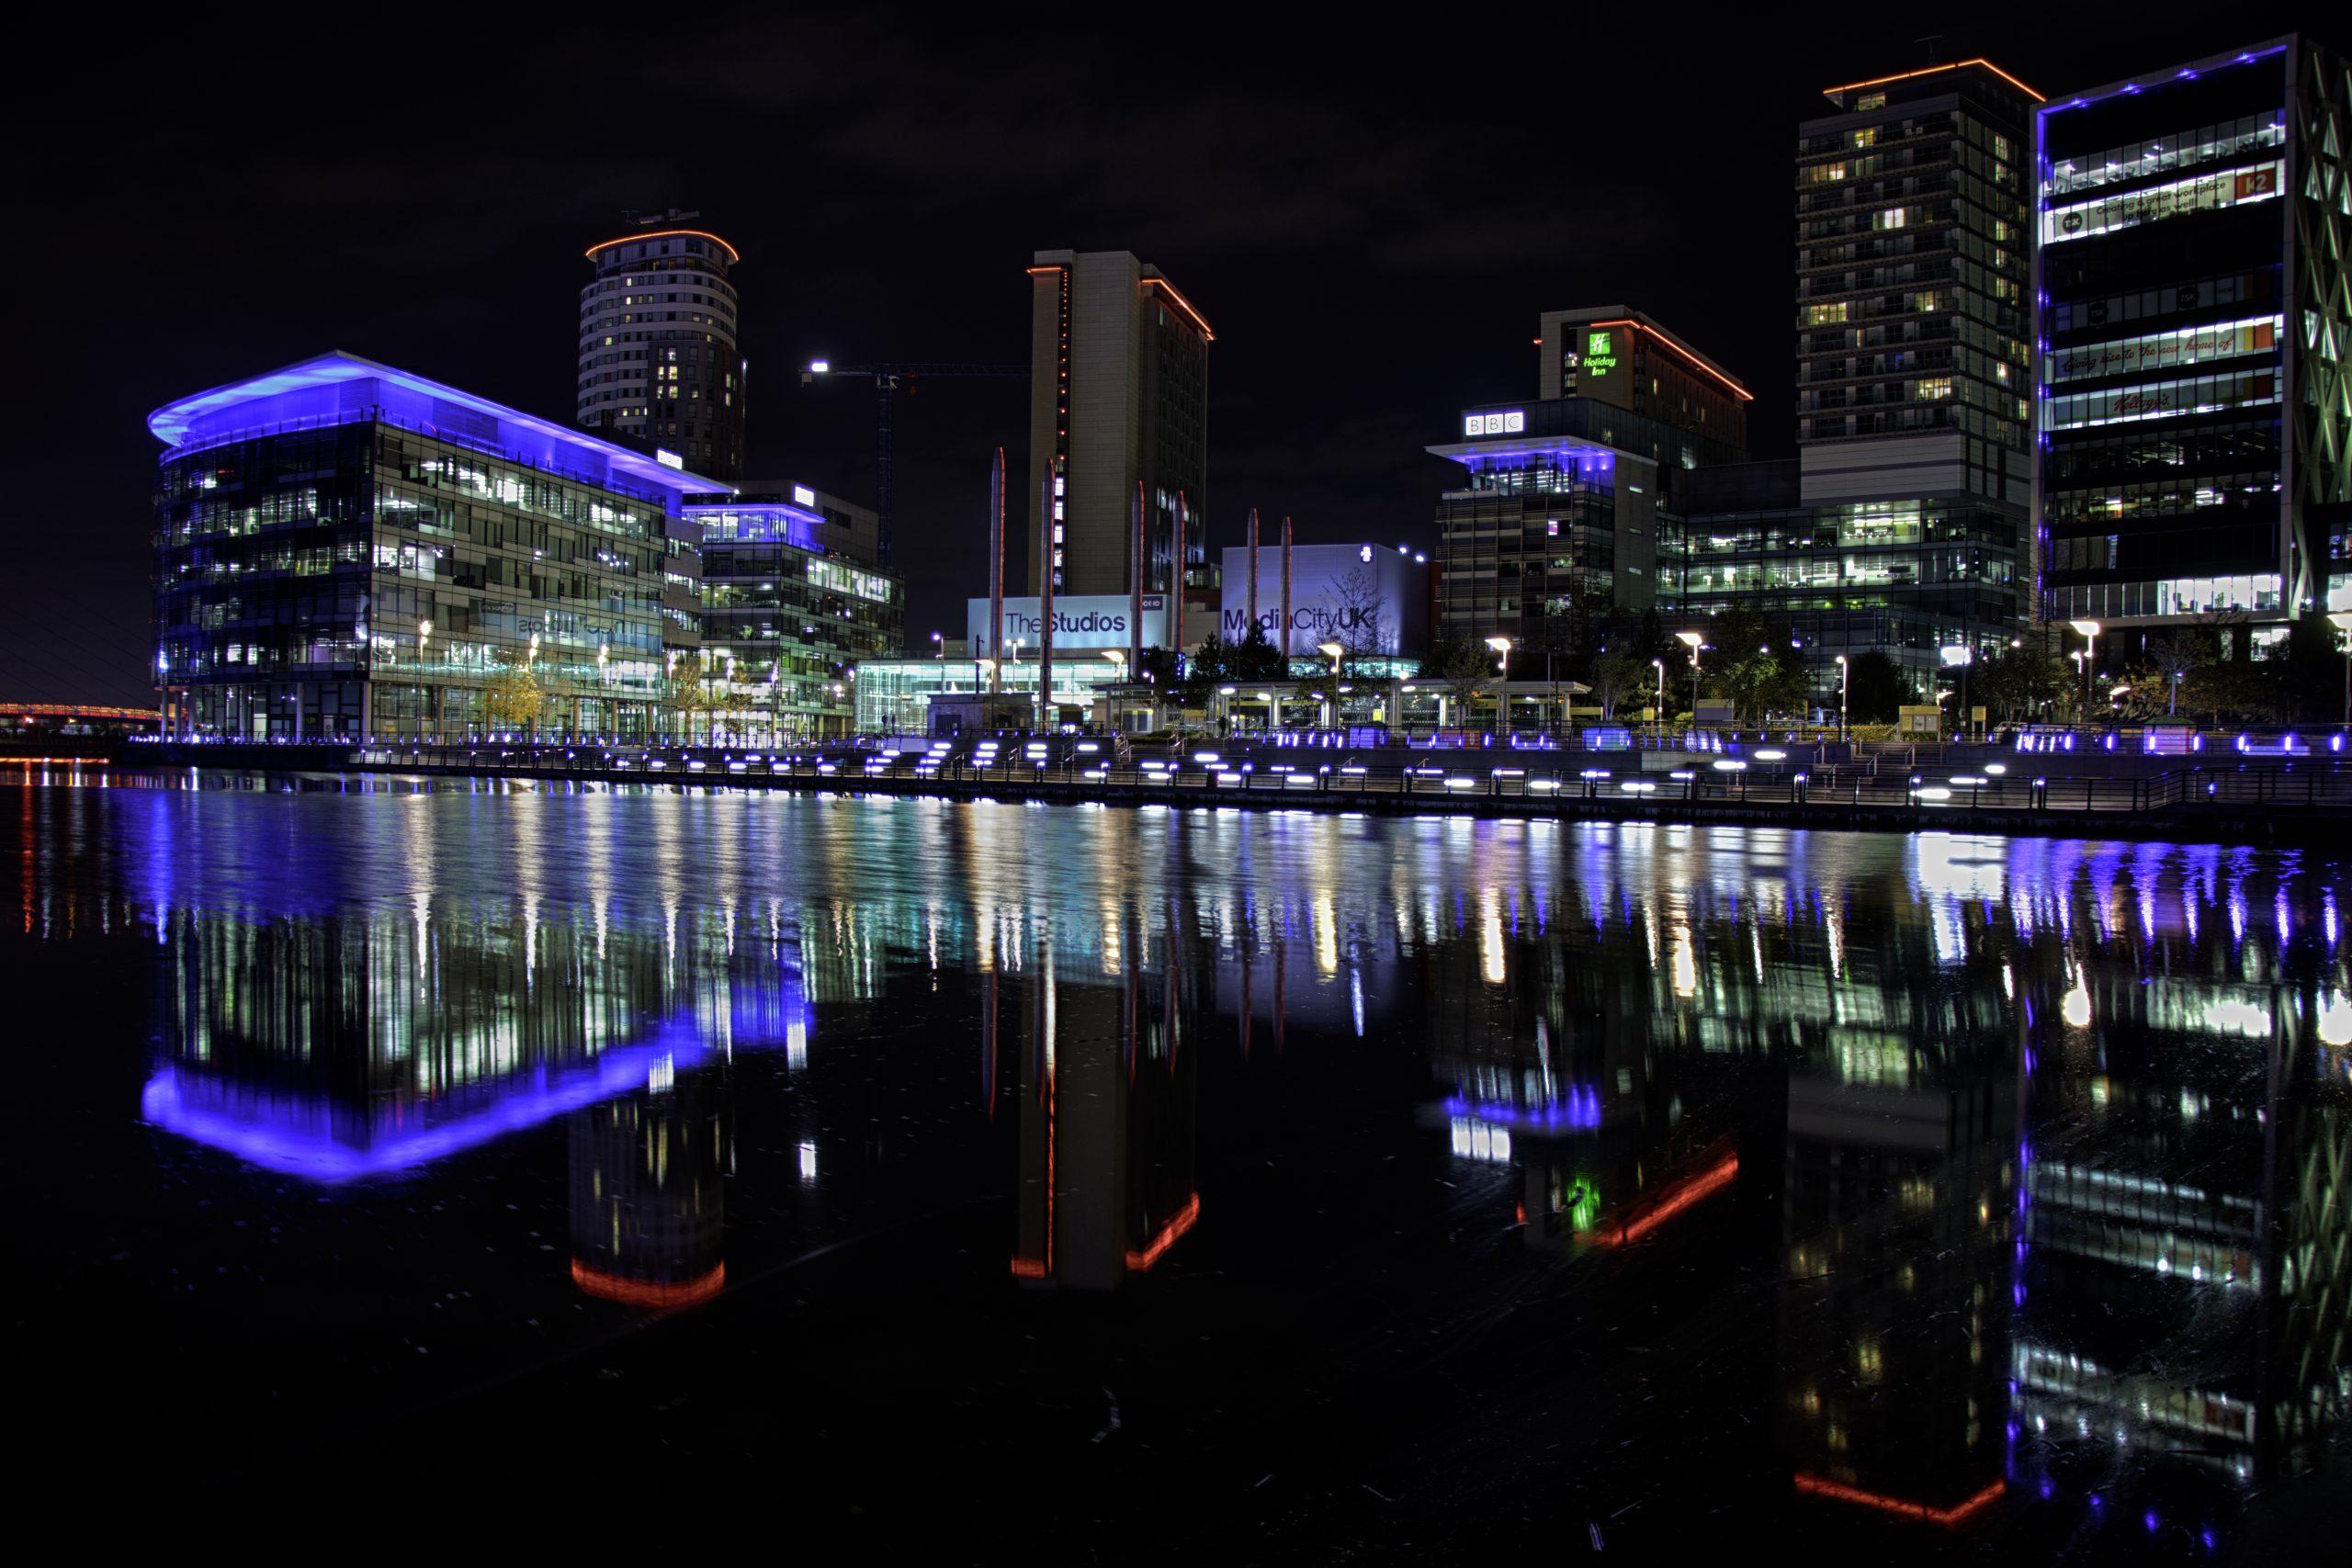 A night time shot of MediaCityUK